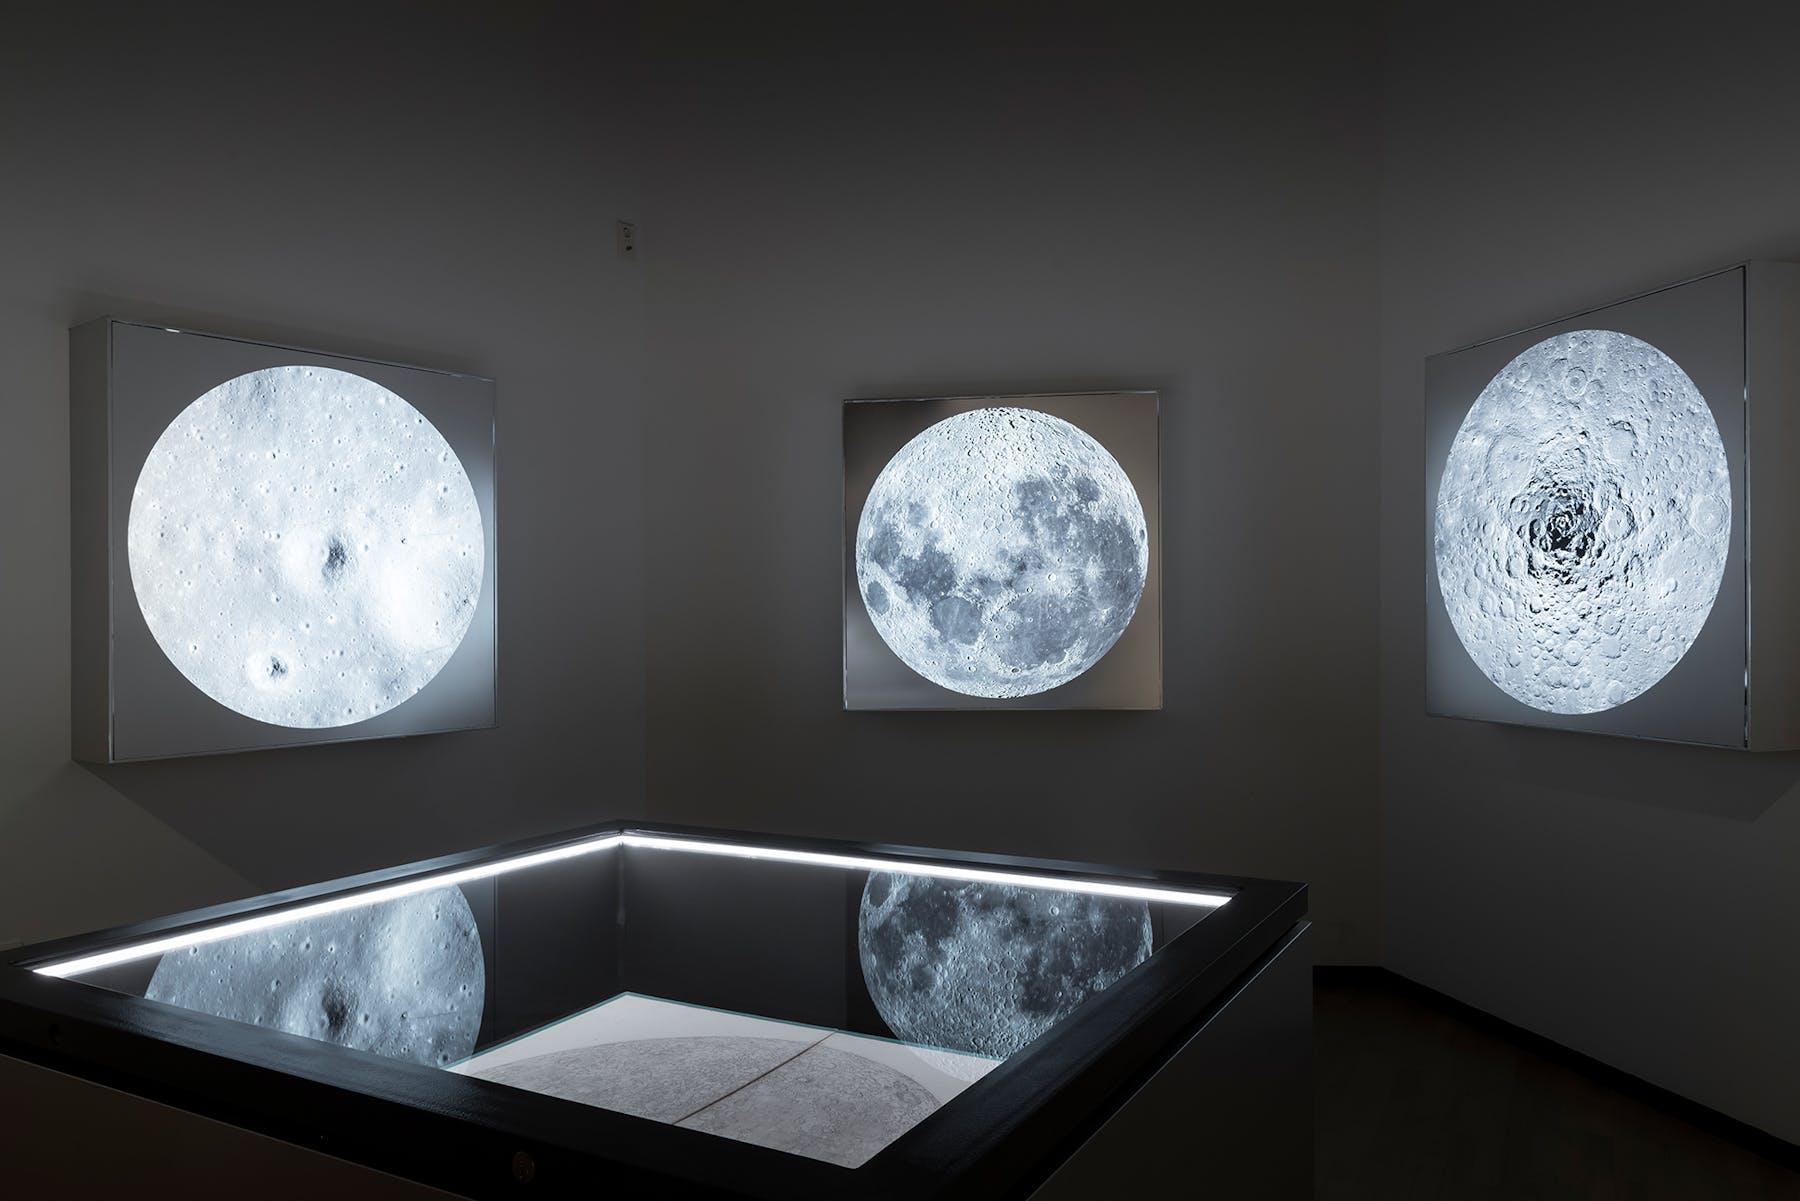 Månen DSC2217